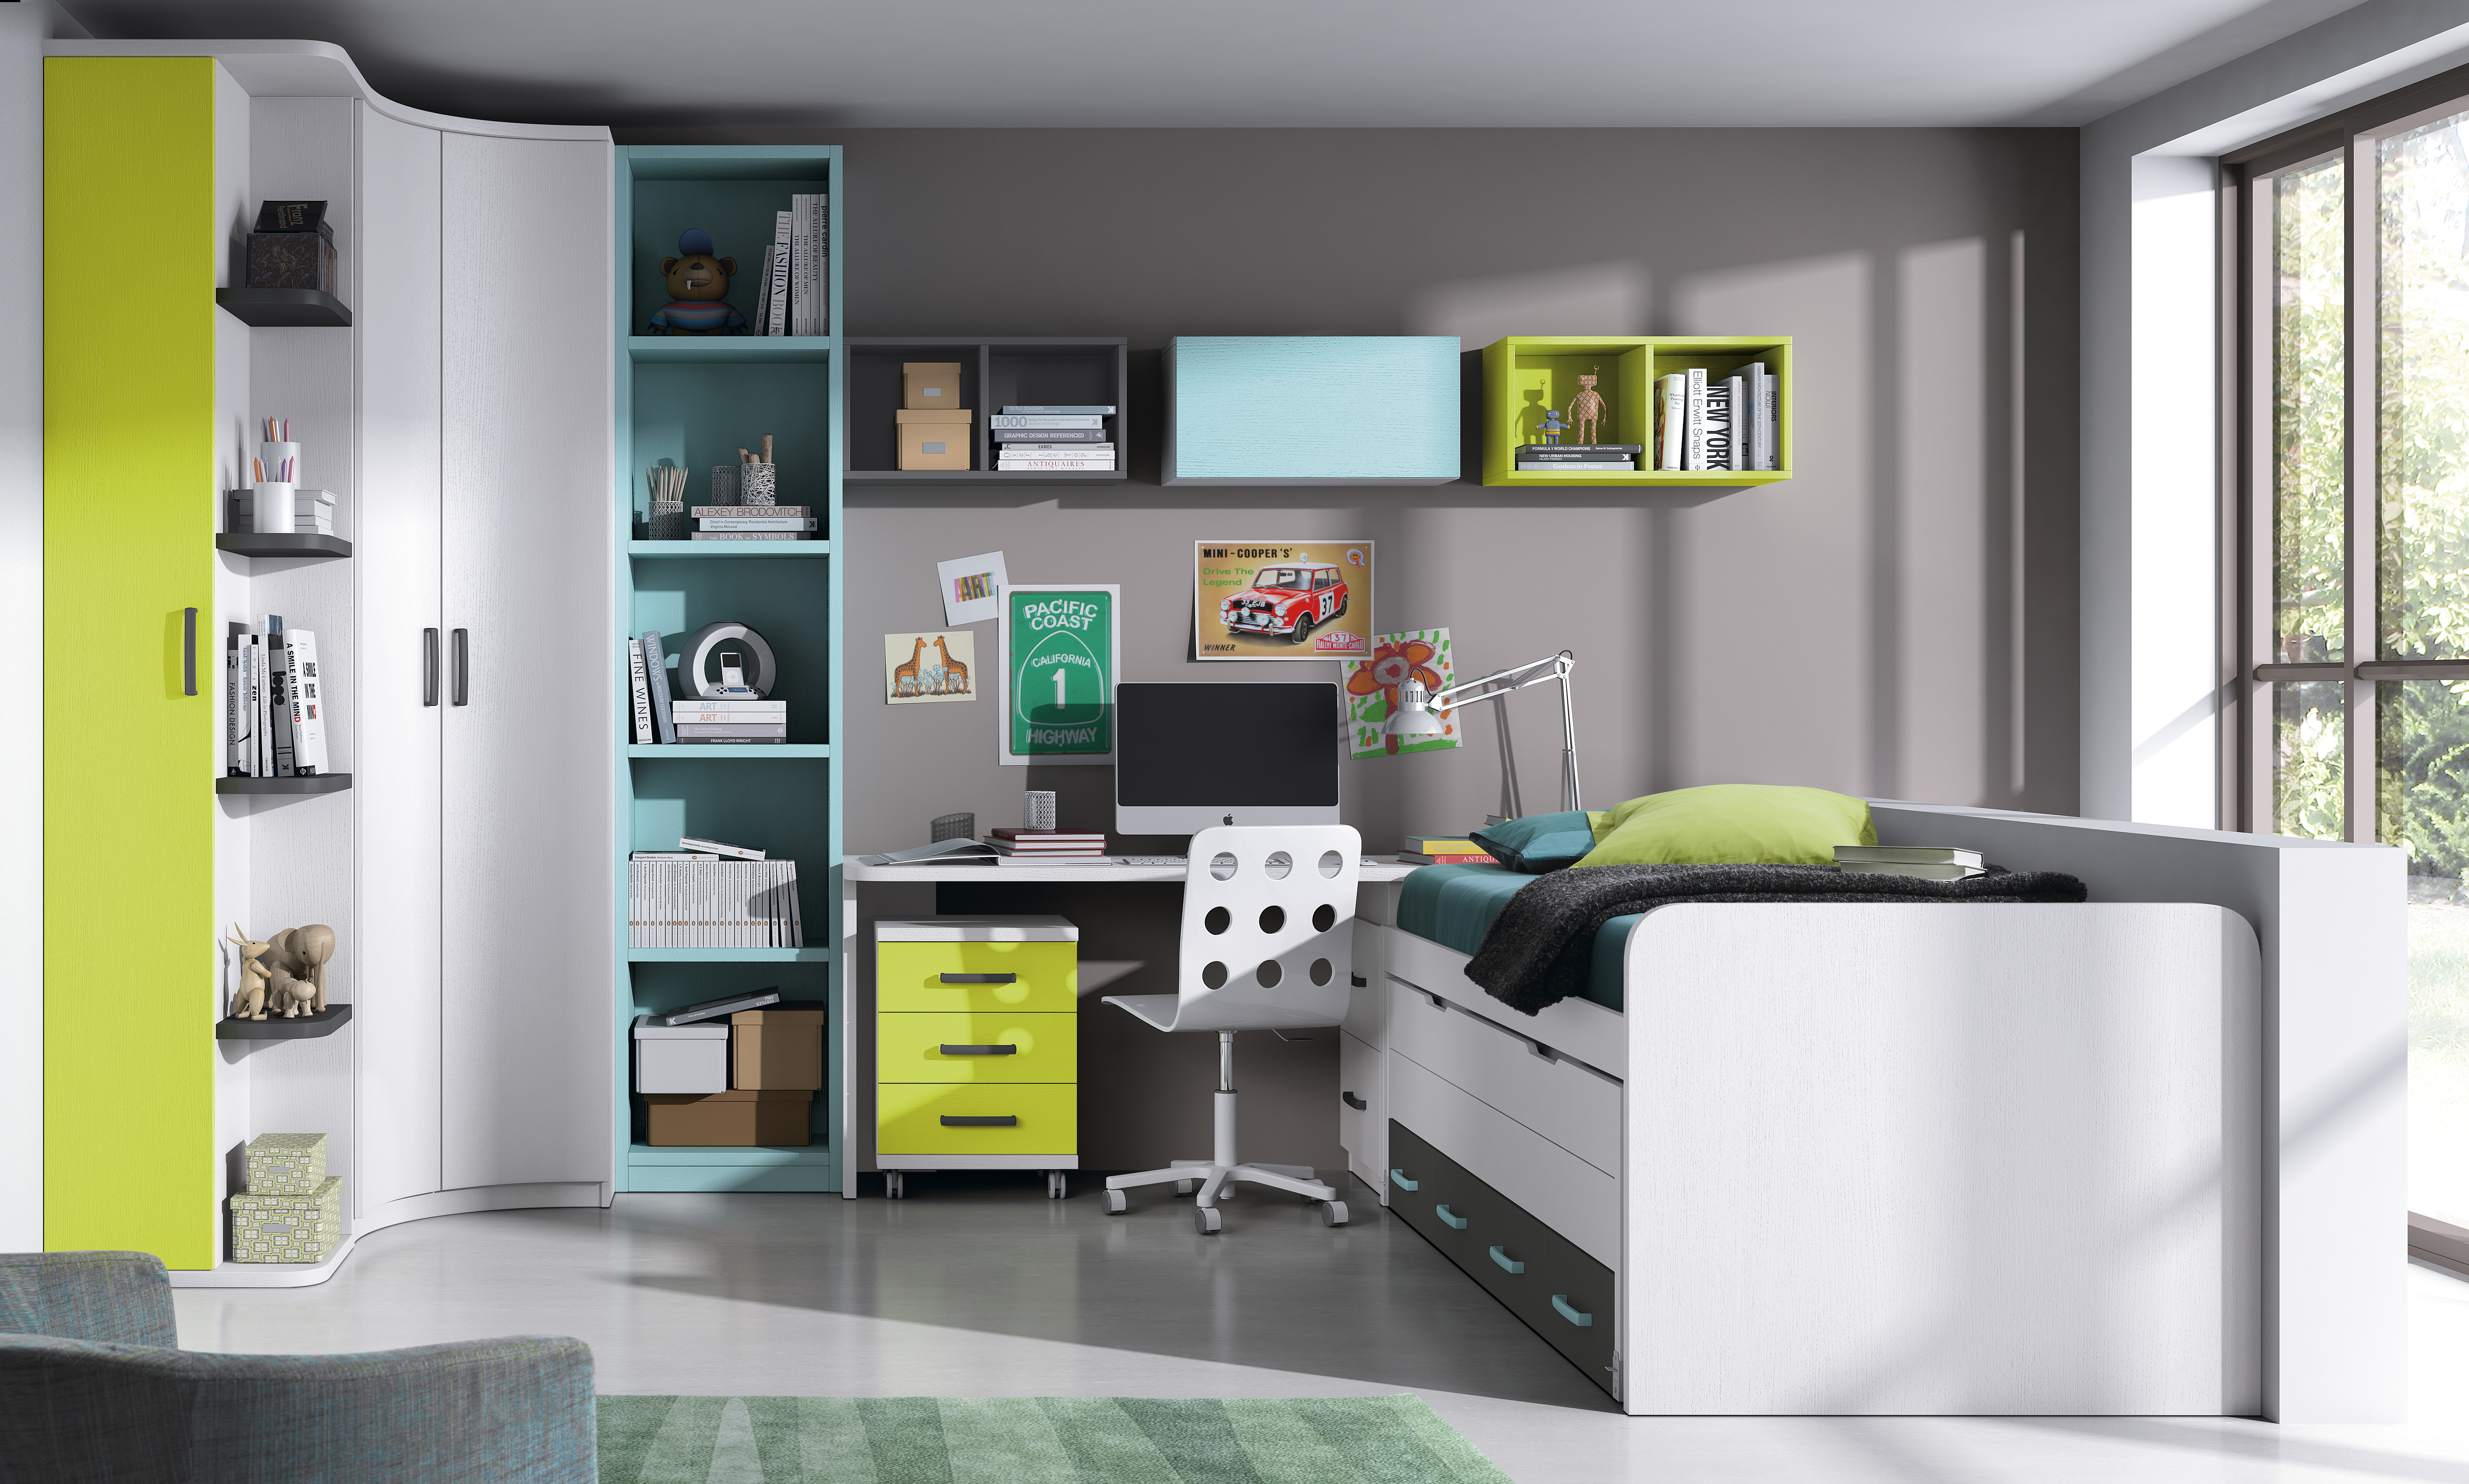 Dormitorios Juveniles Nietohogar